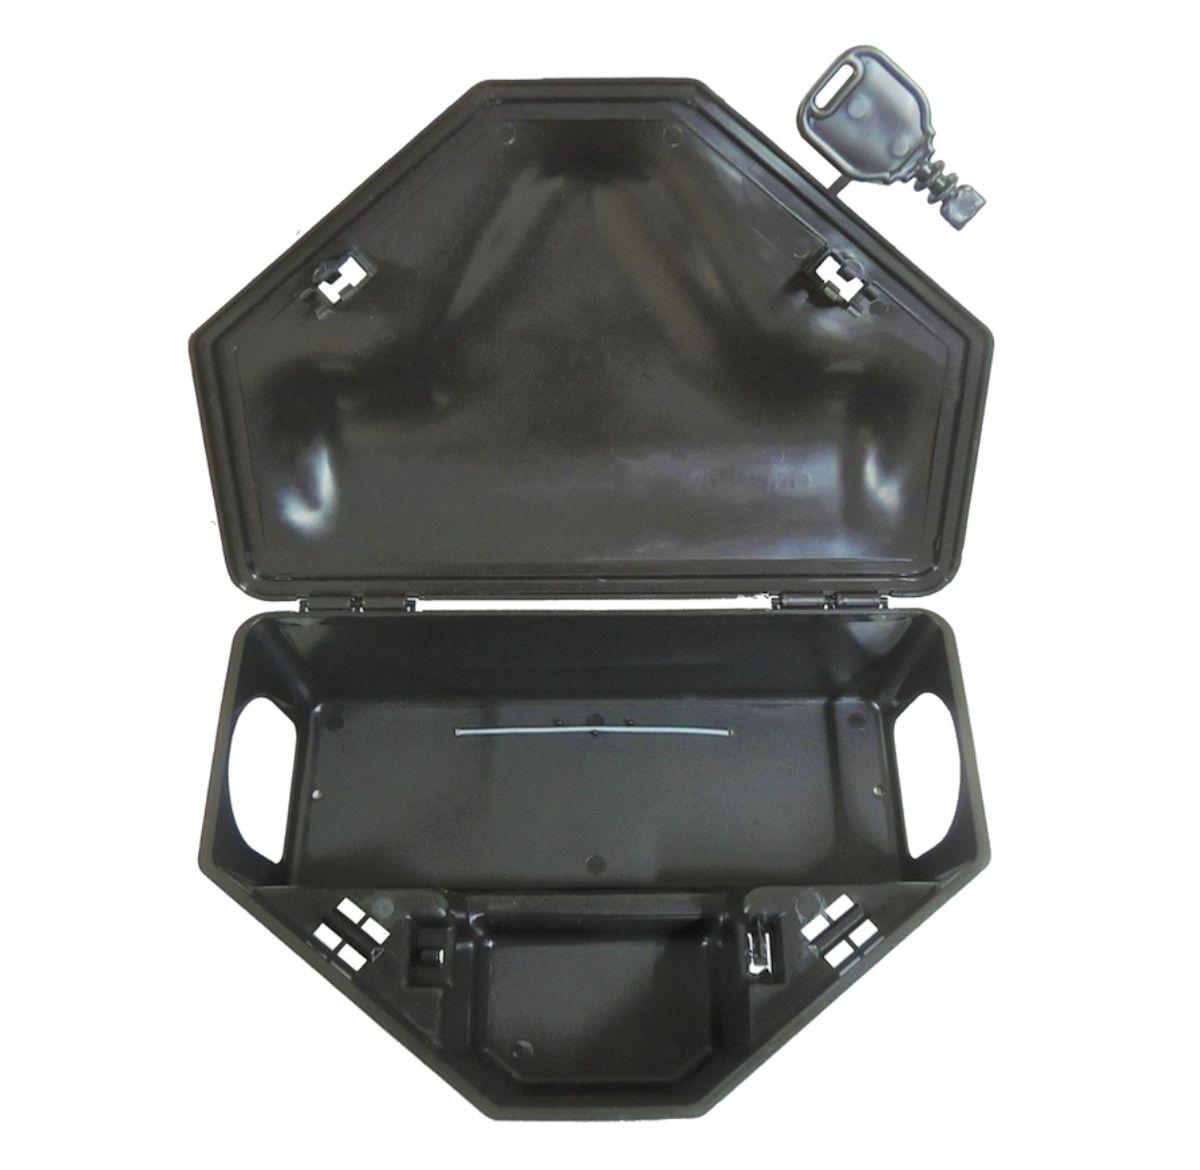 Kit 37 Porta Isca Com 2 Chaves - Duplo Travamento